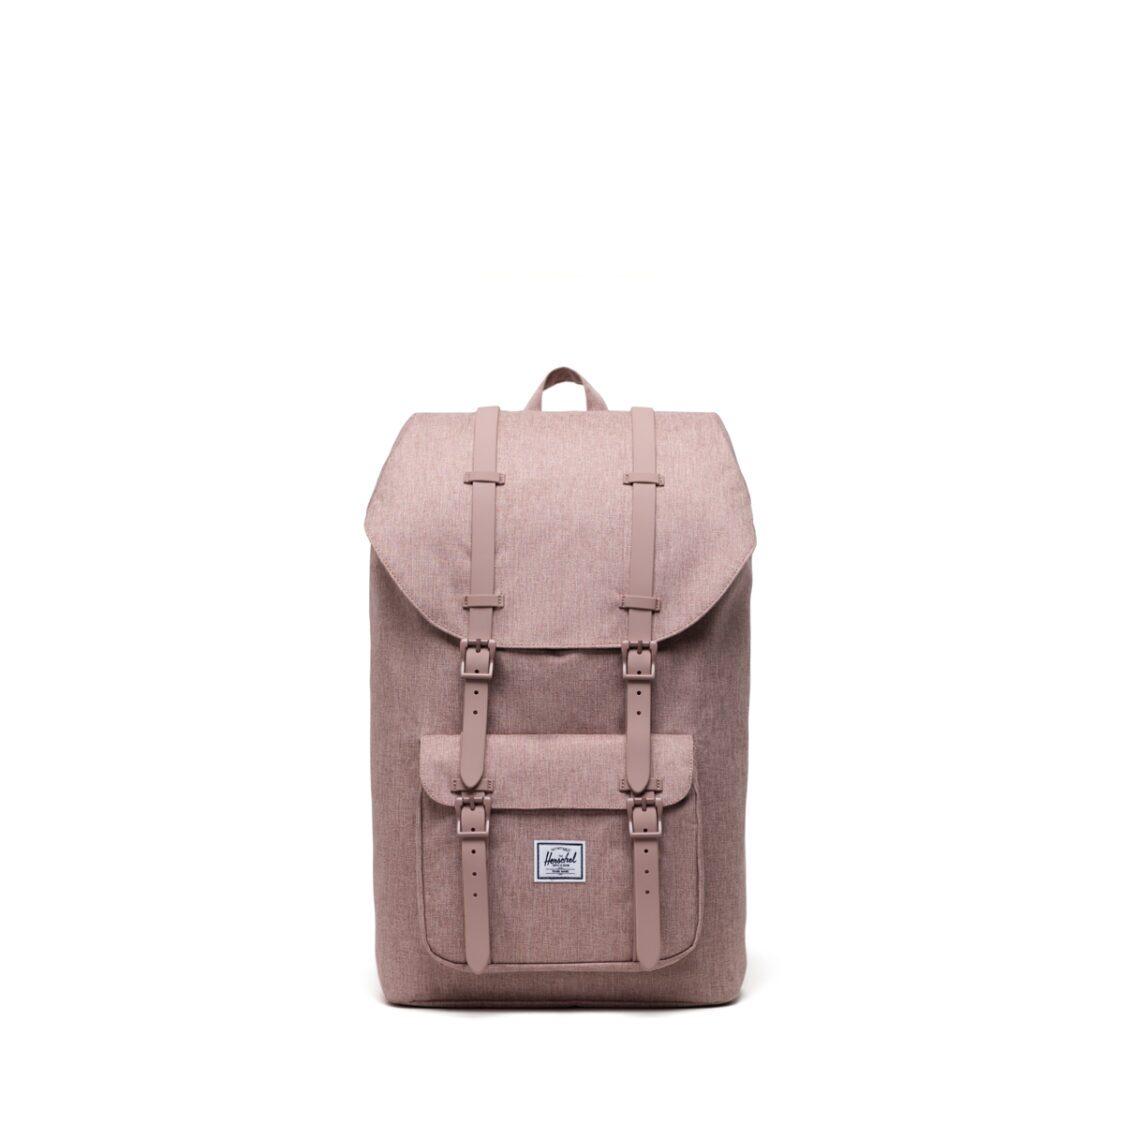 Herschel Little America Ash Rose Crosshatch Backpack 10014-04885-OS